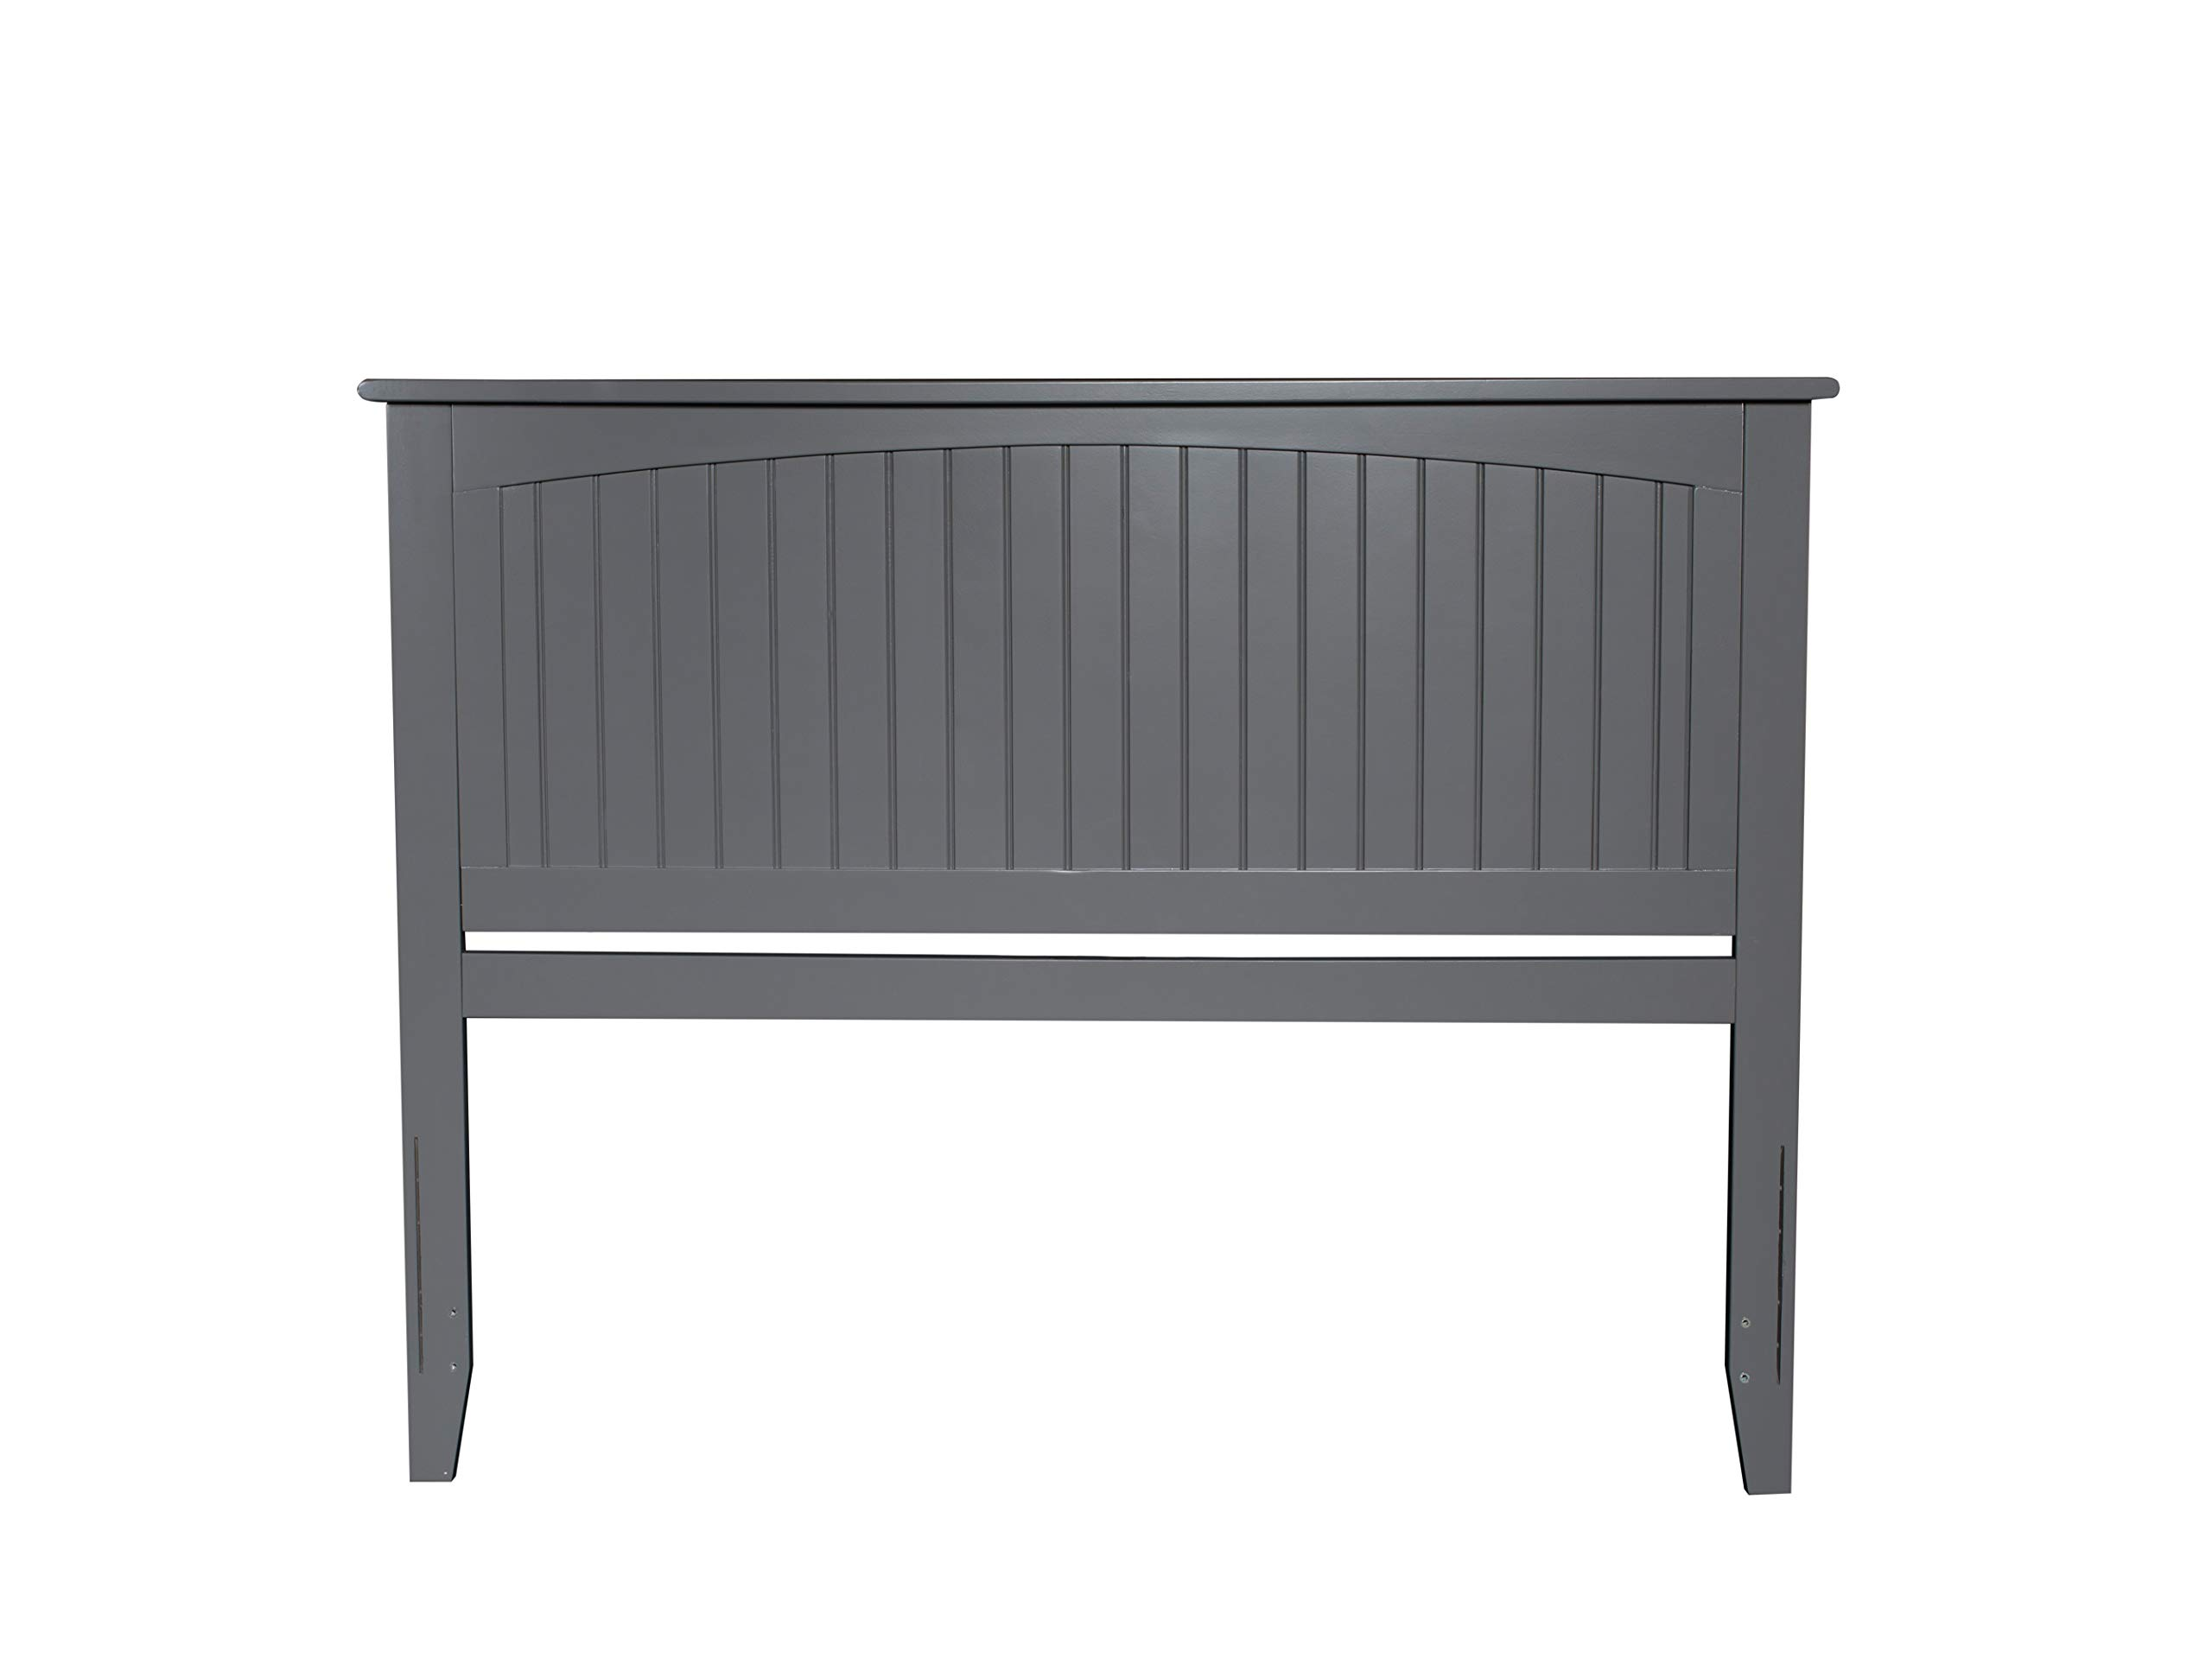 Atlantic Furniture AR282859 Nantucket Headboard, King, Grey by Atlantic Furniture